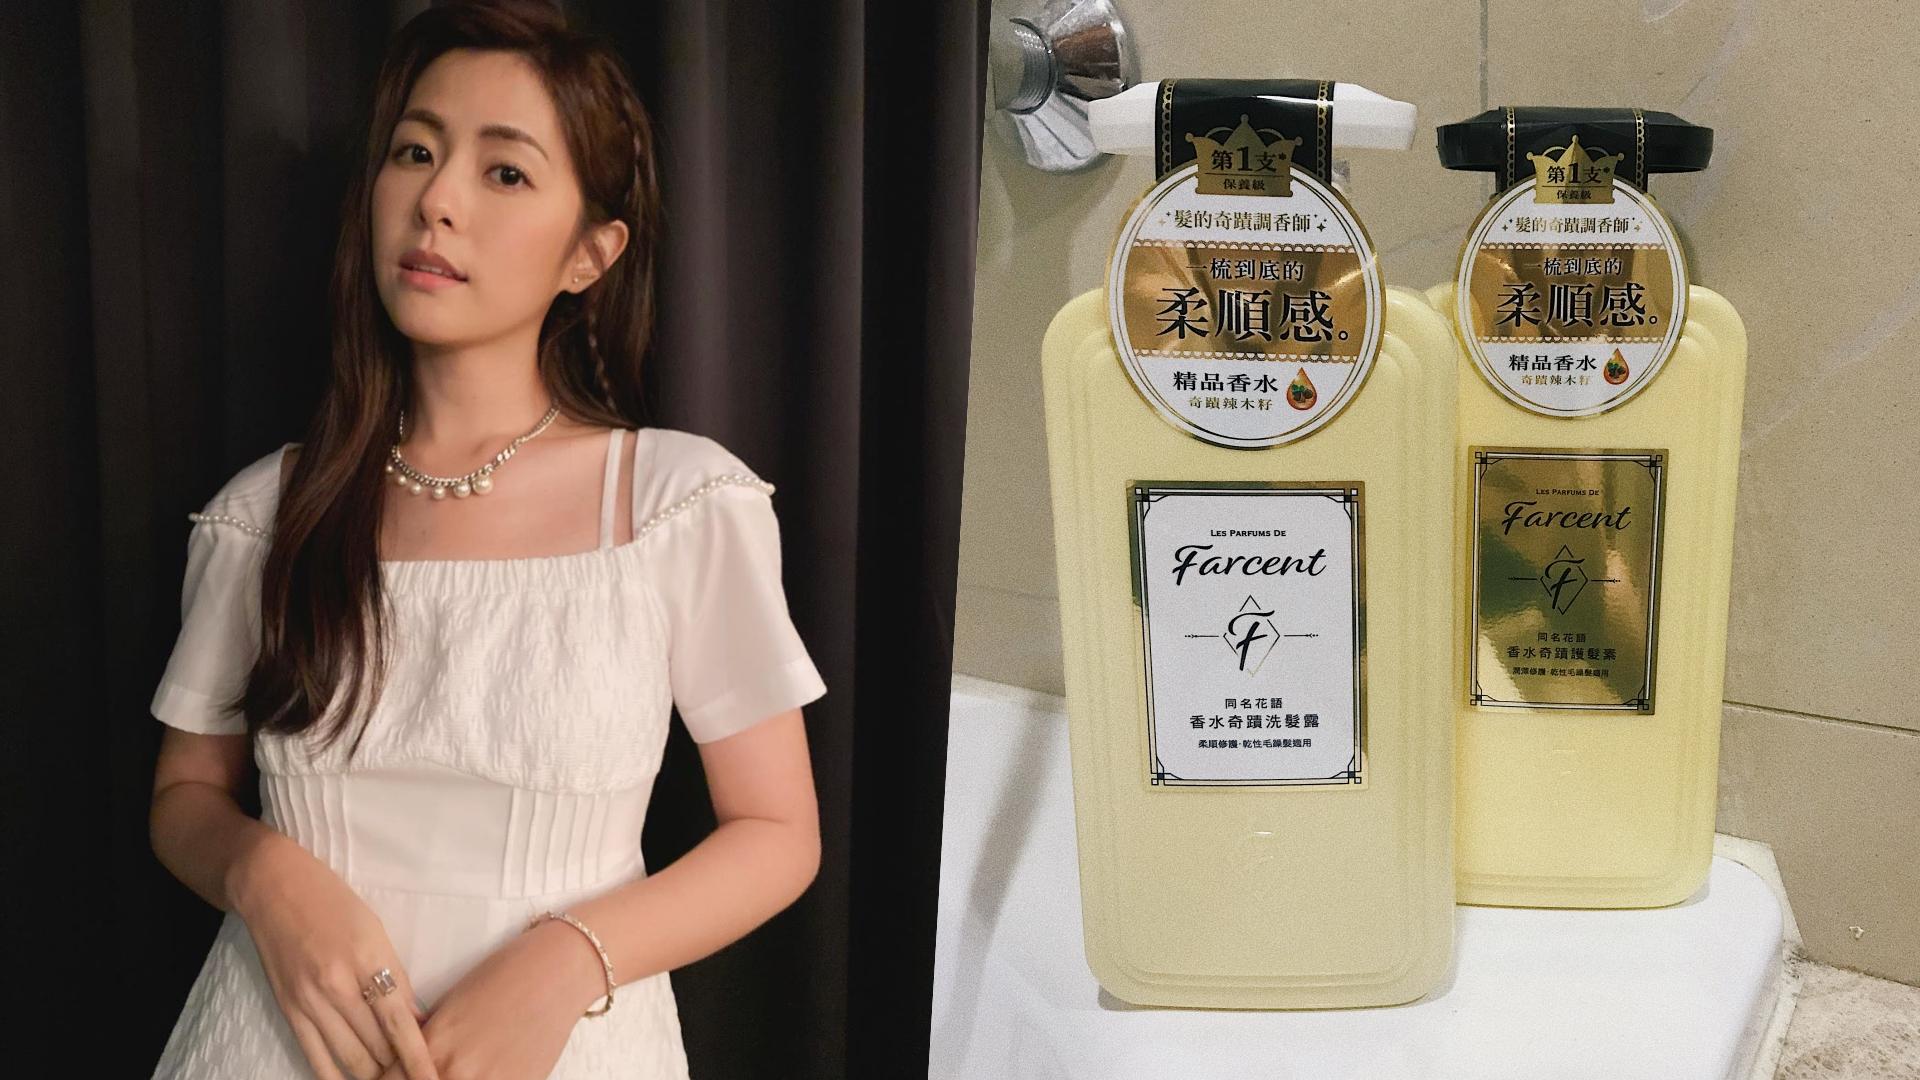 Farcent的洗護產品擁有精品等級的香氣,更添加頭皮養護成分!